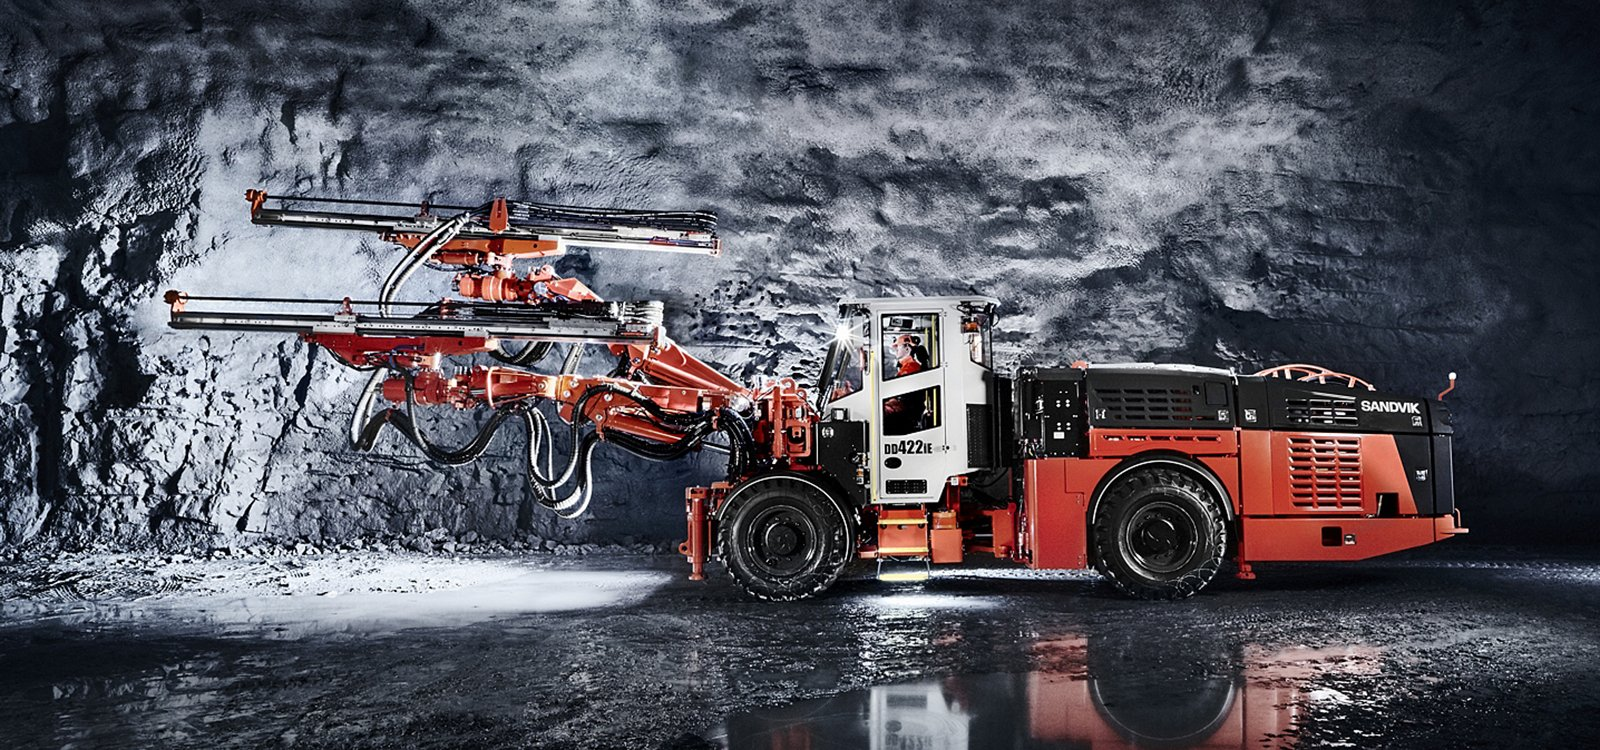 A revolutionary mining jumbo, Sandvik DD422iE offers safe and efficient drift development with zero underground emissions.